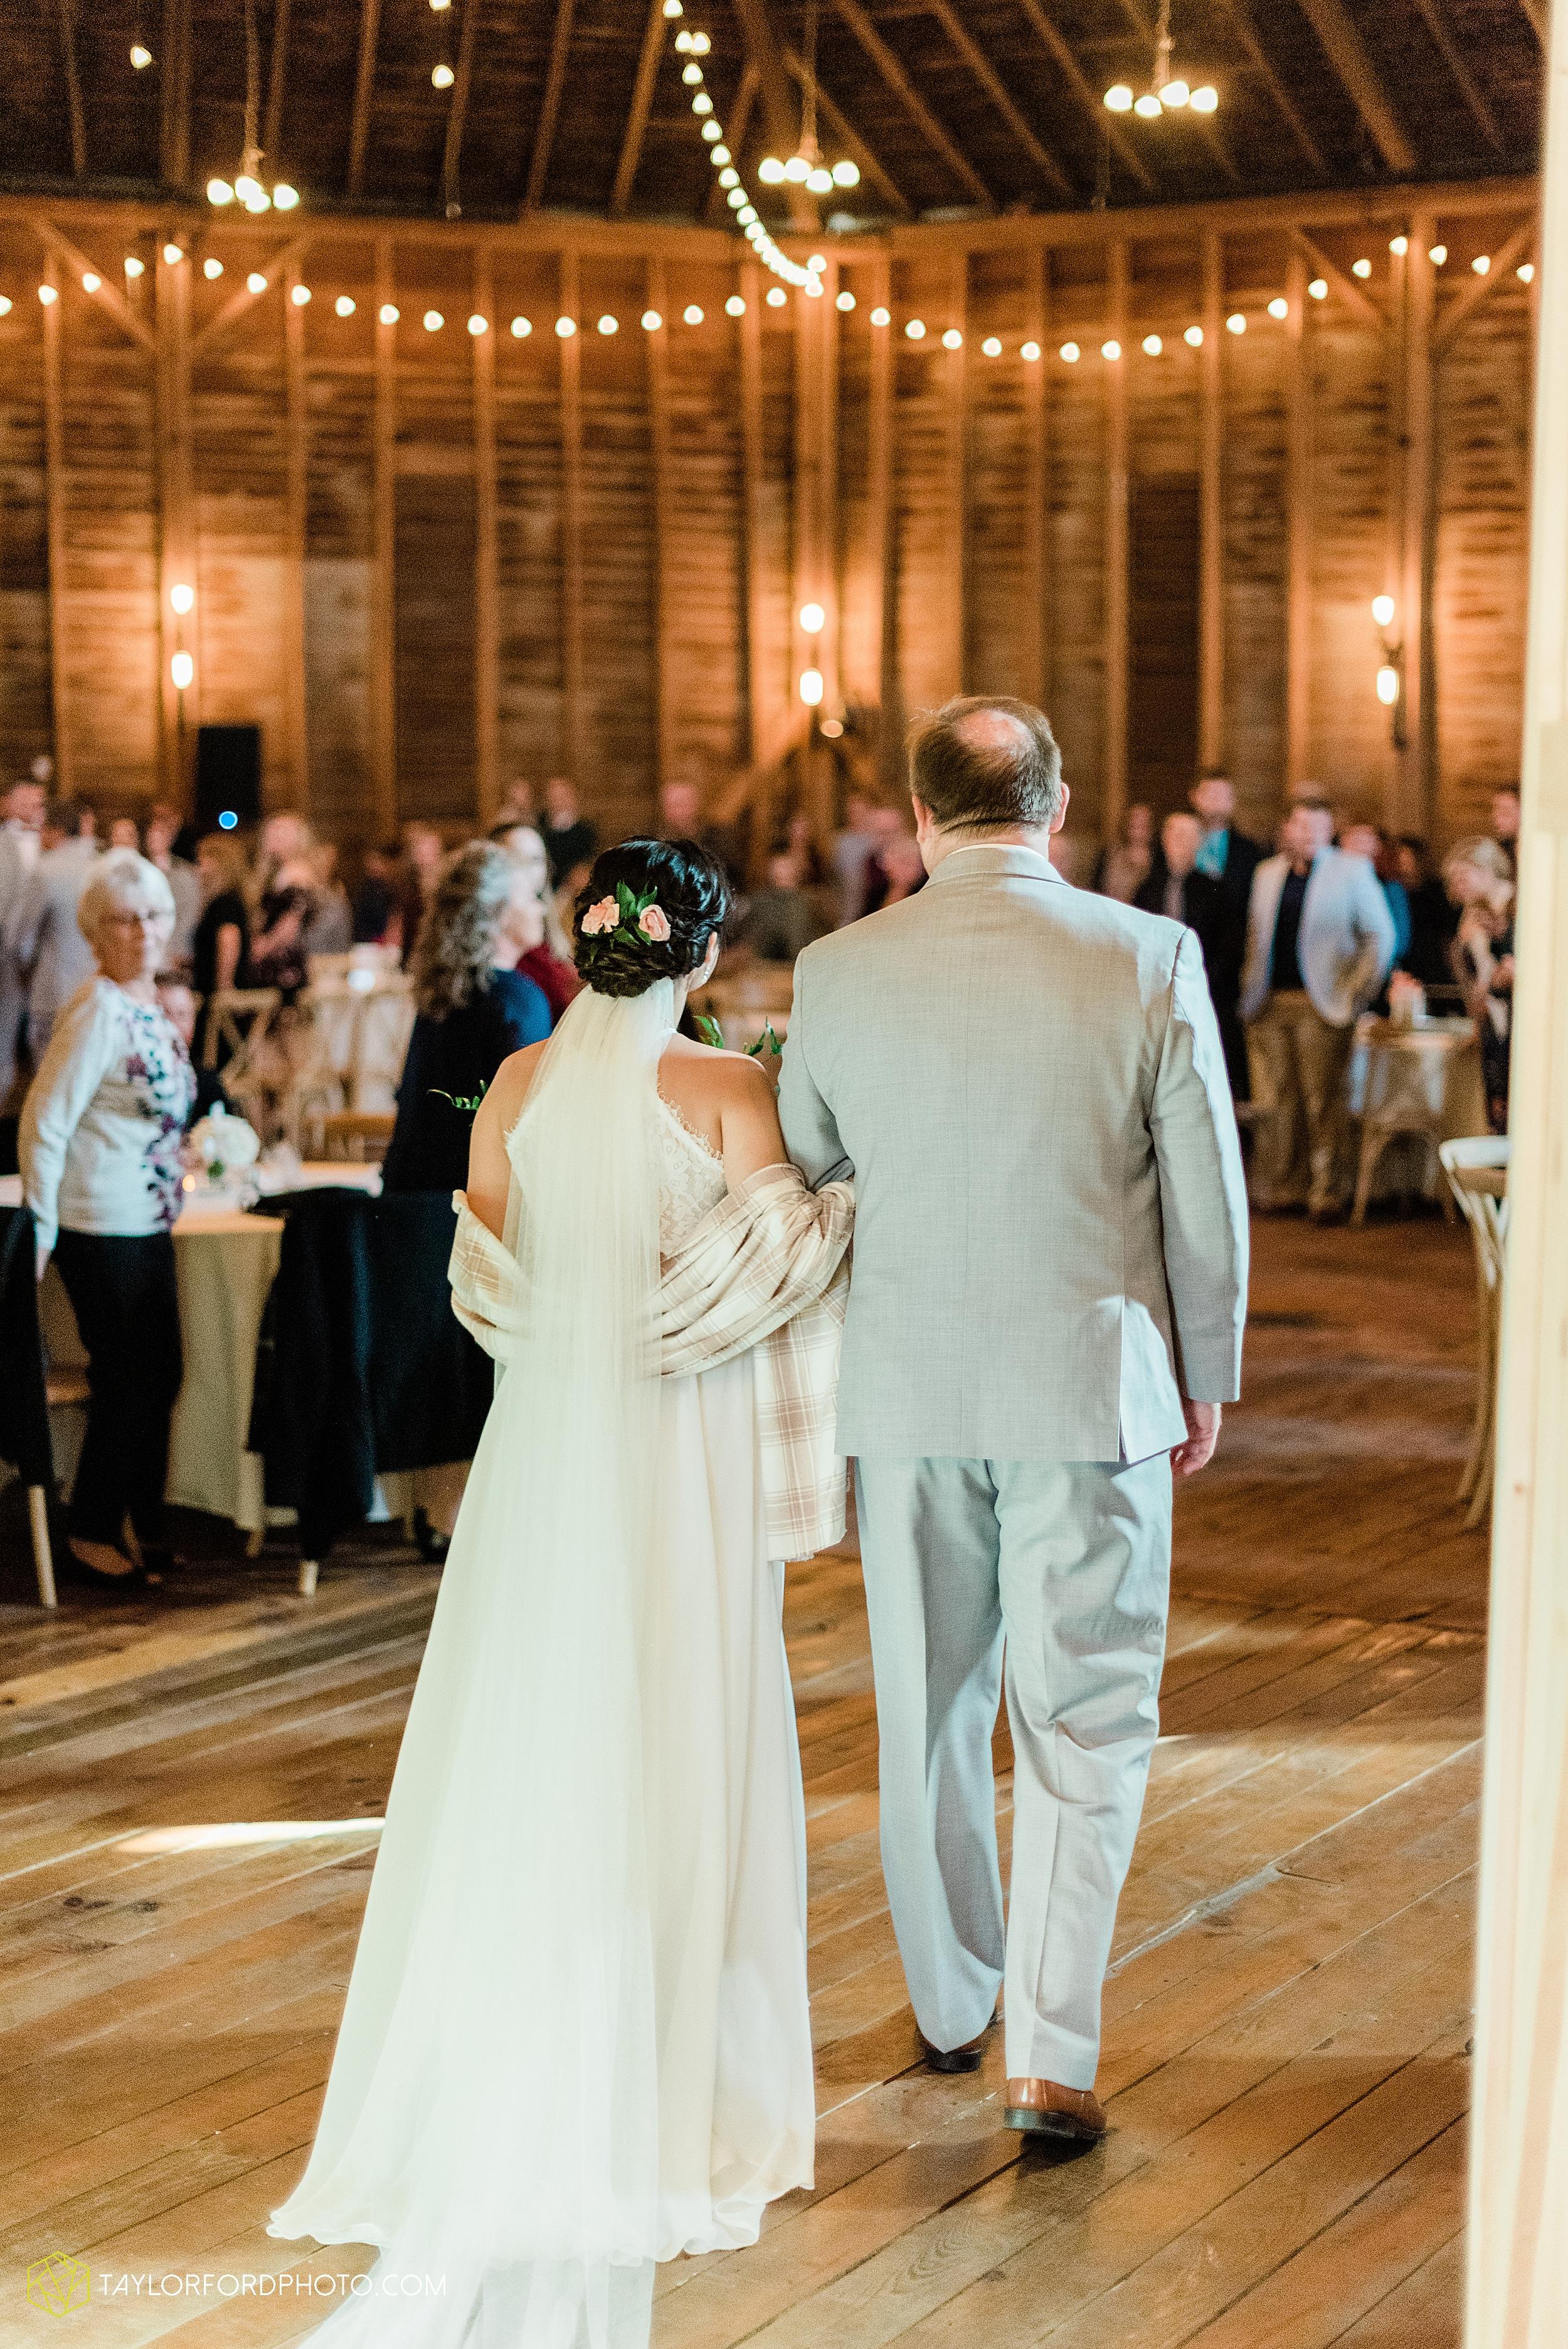 marissa-nicole-nick-daeger-orrmont-estate-farm-wedding-piqua-dayton-troy-ohio-fall-photographer-taylor-ford-photography_1526.jpg